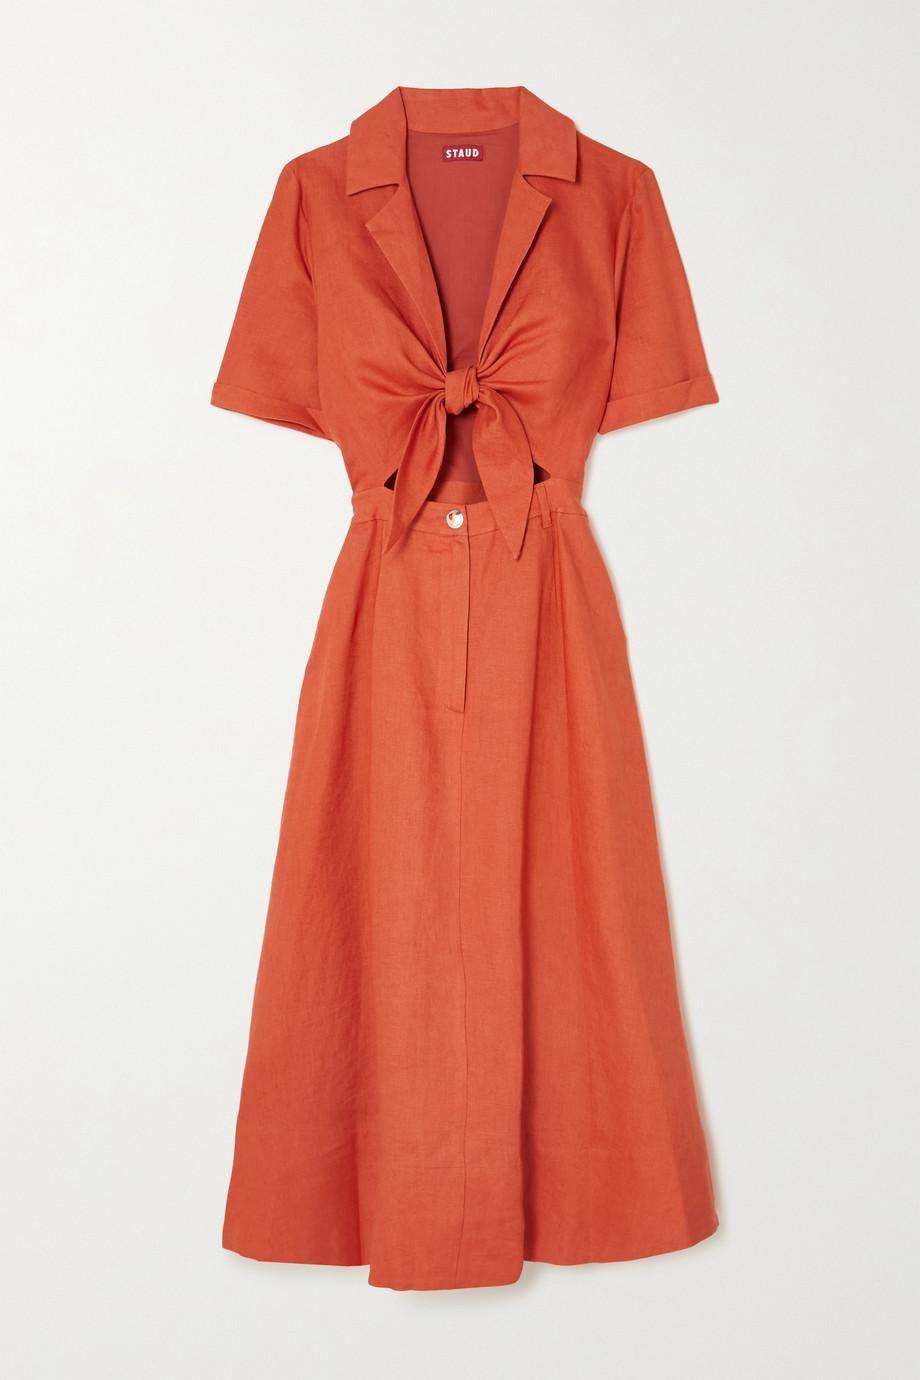 Giorgiana Cutout Linen Midi Dress